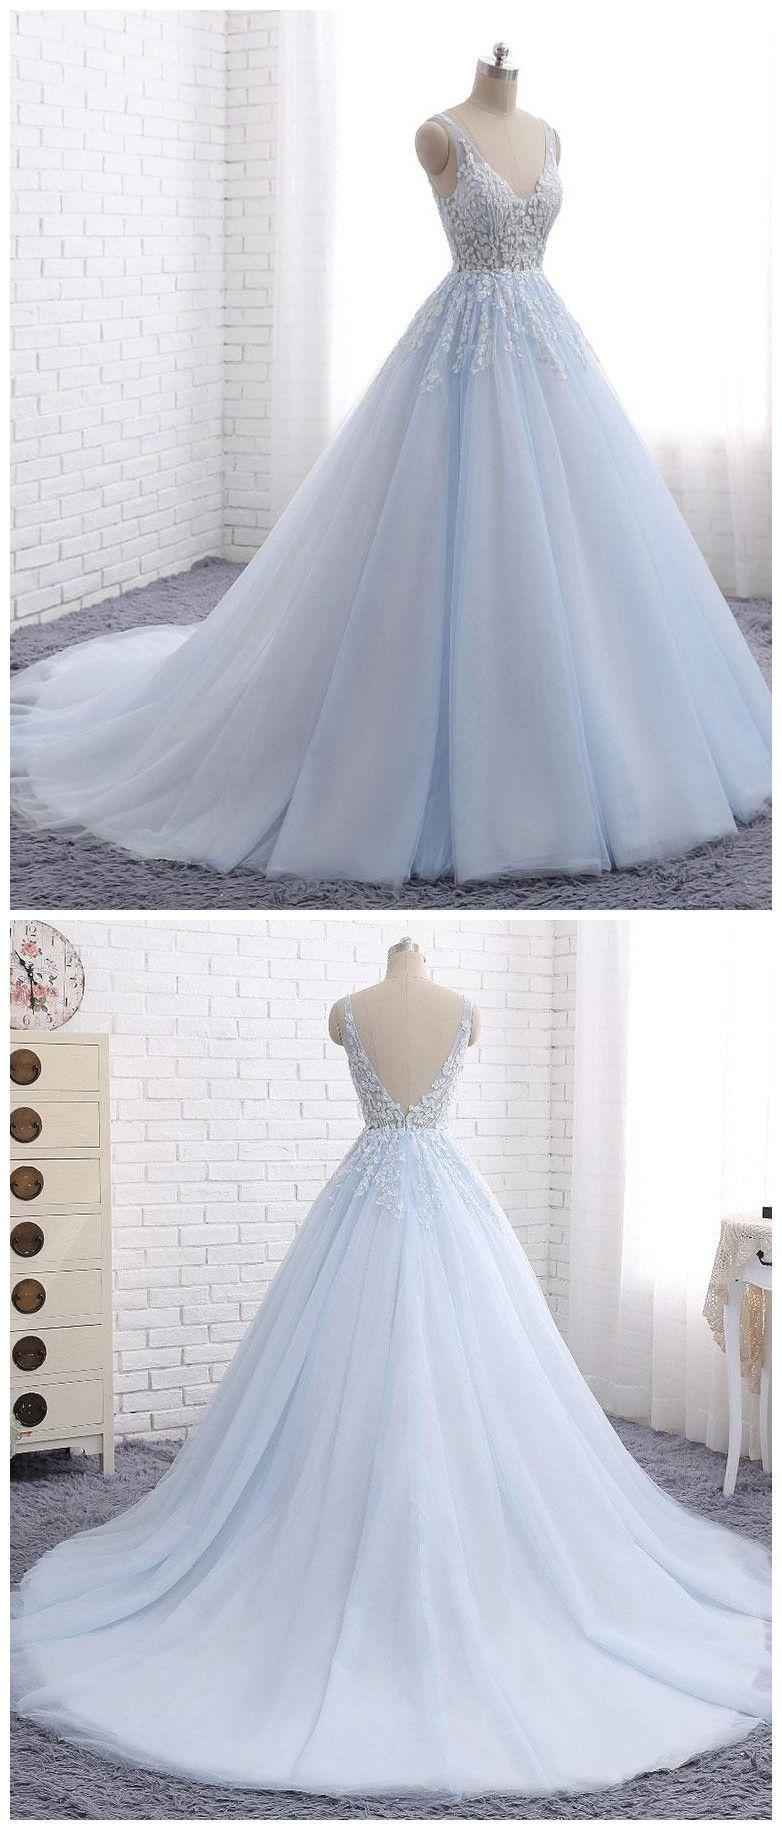 Prom dressesnew fashion prom dressesblue tulle long v neck